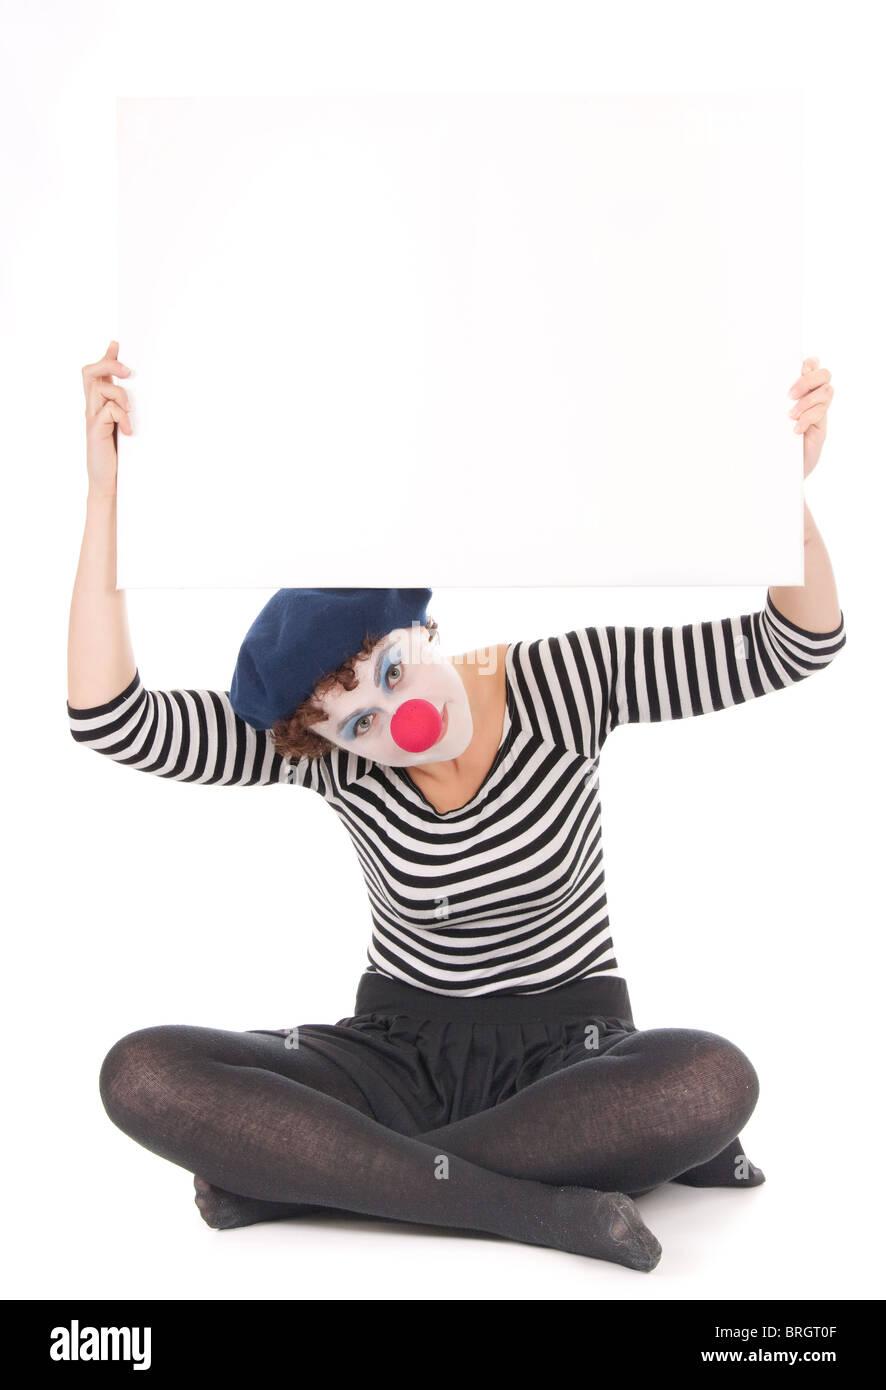 clown woman cross legged on floor holding blank billboard - Stock Image